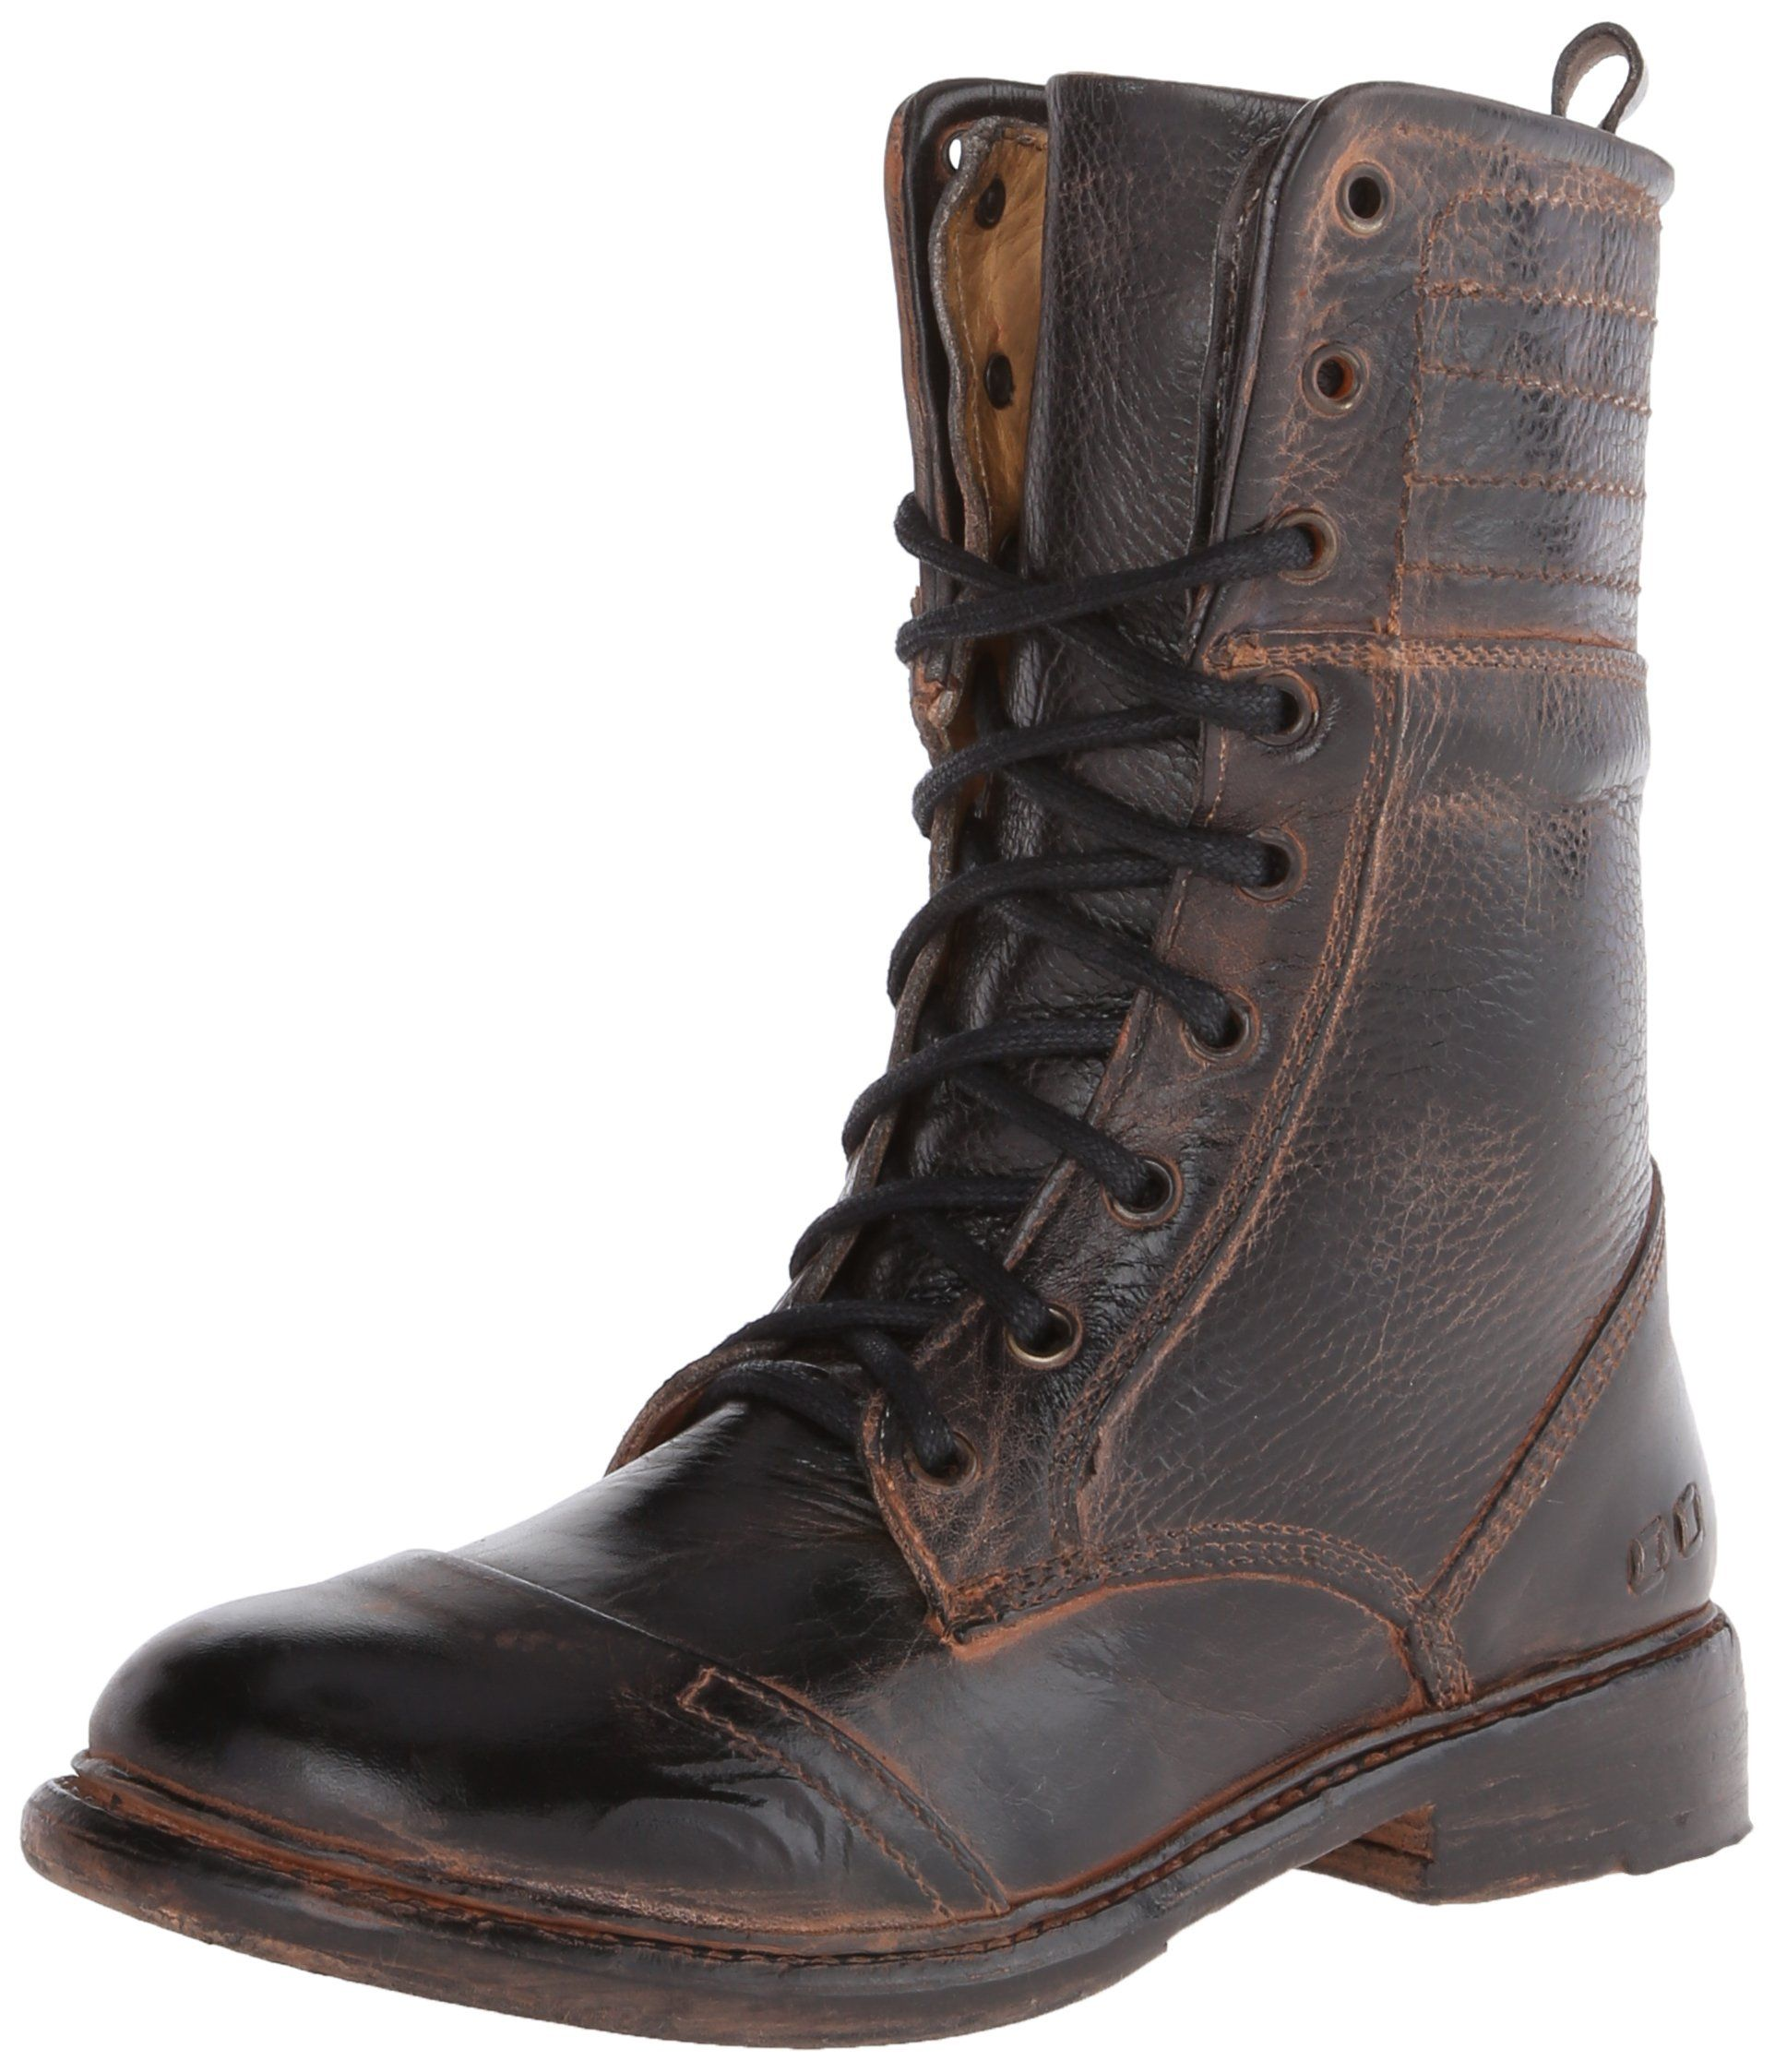 Bed Stu Women's Roanne Boot,Black Rustic Rust,8.5 M US